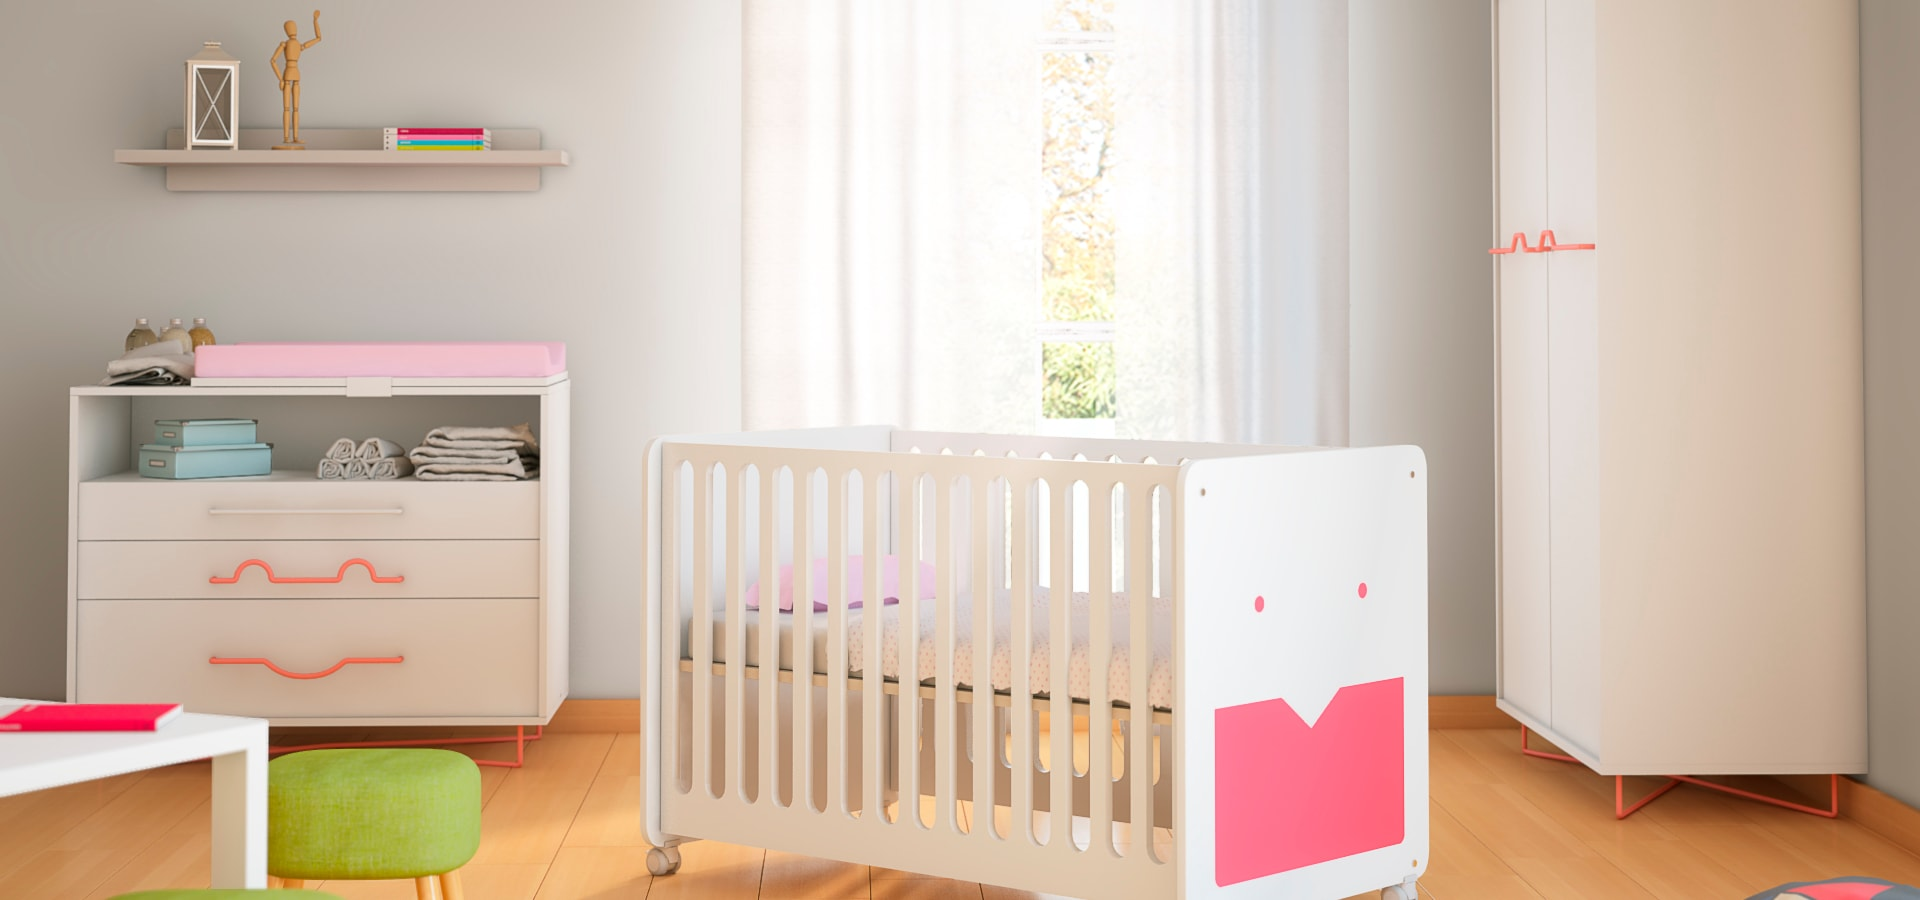 moti mobiliario y decoracion infantil moti mobiliario